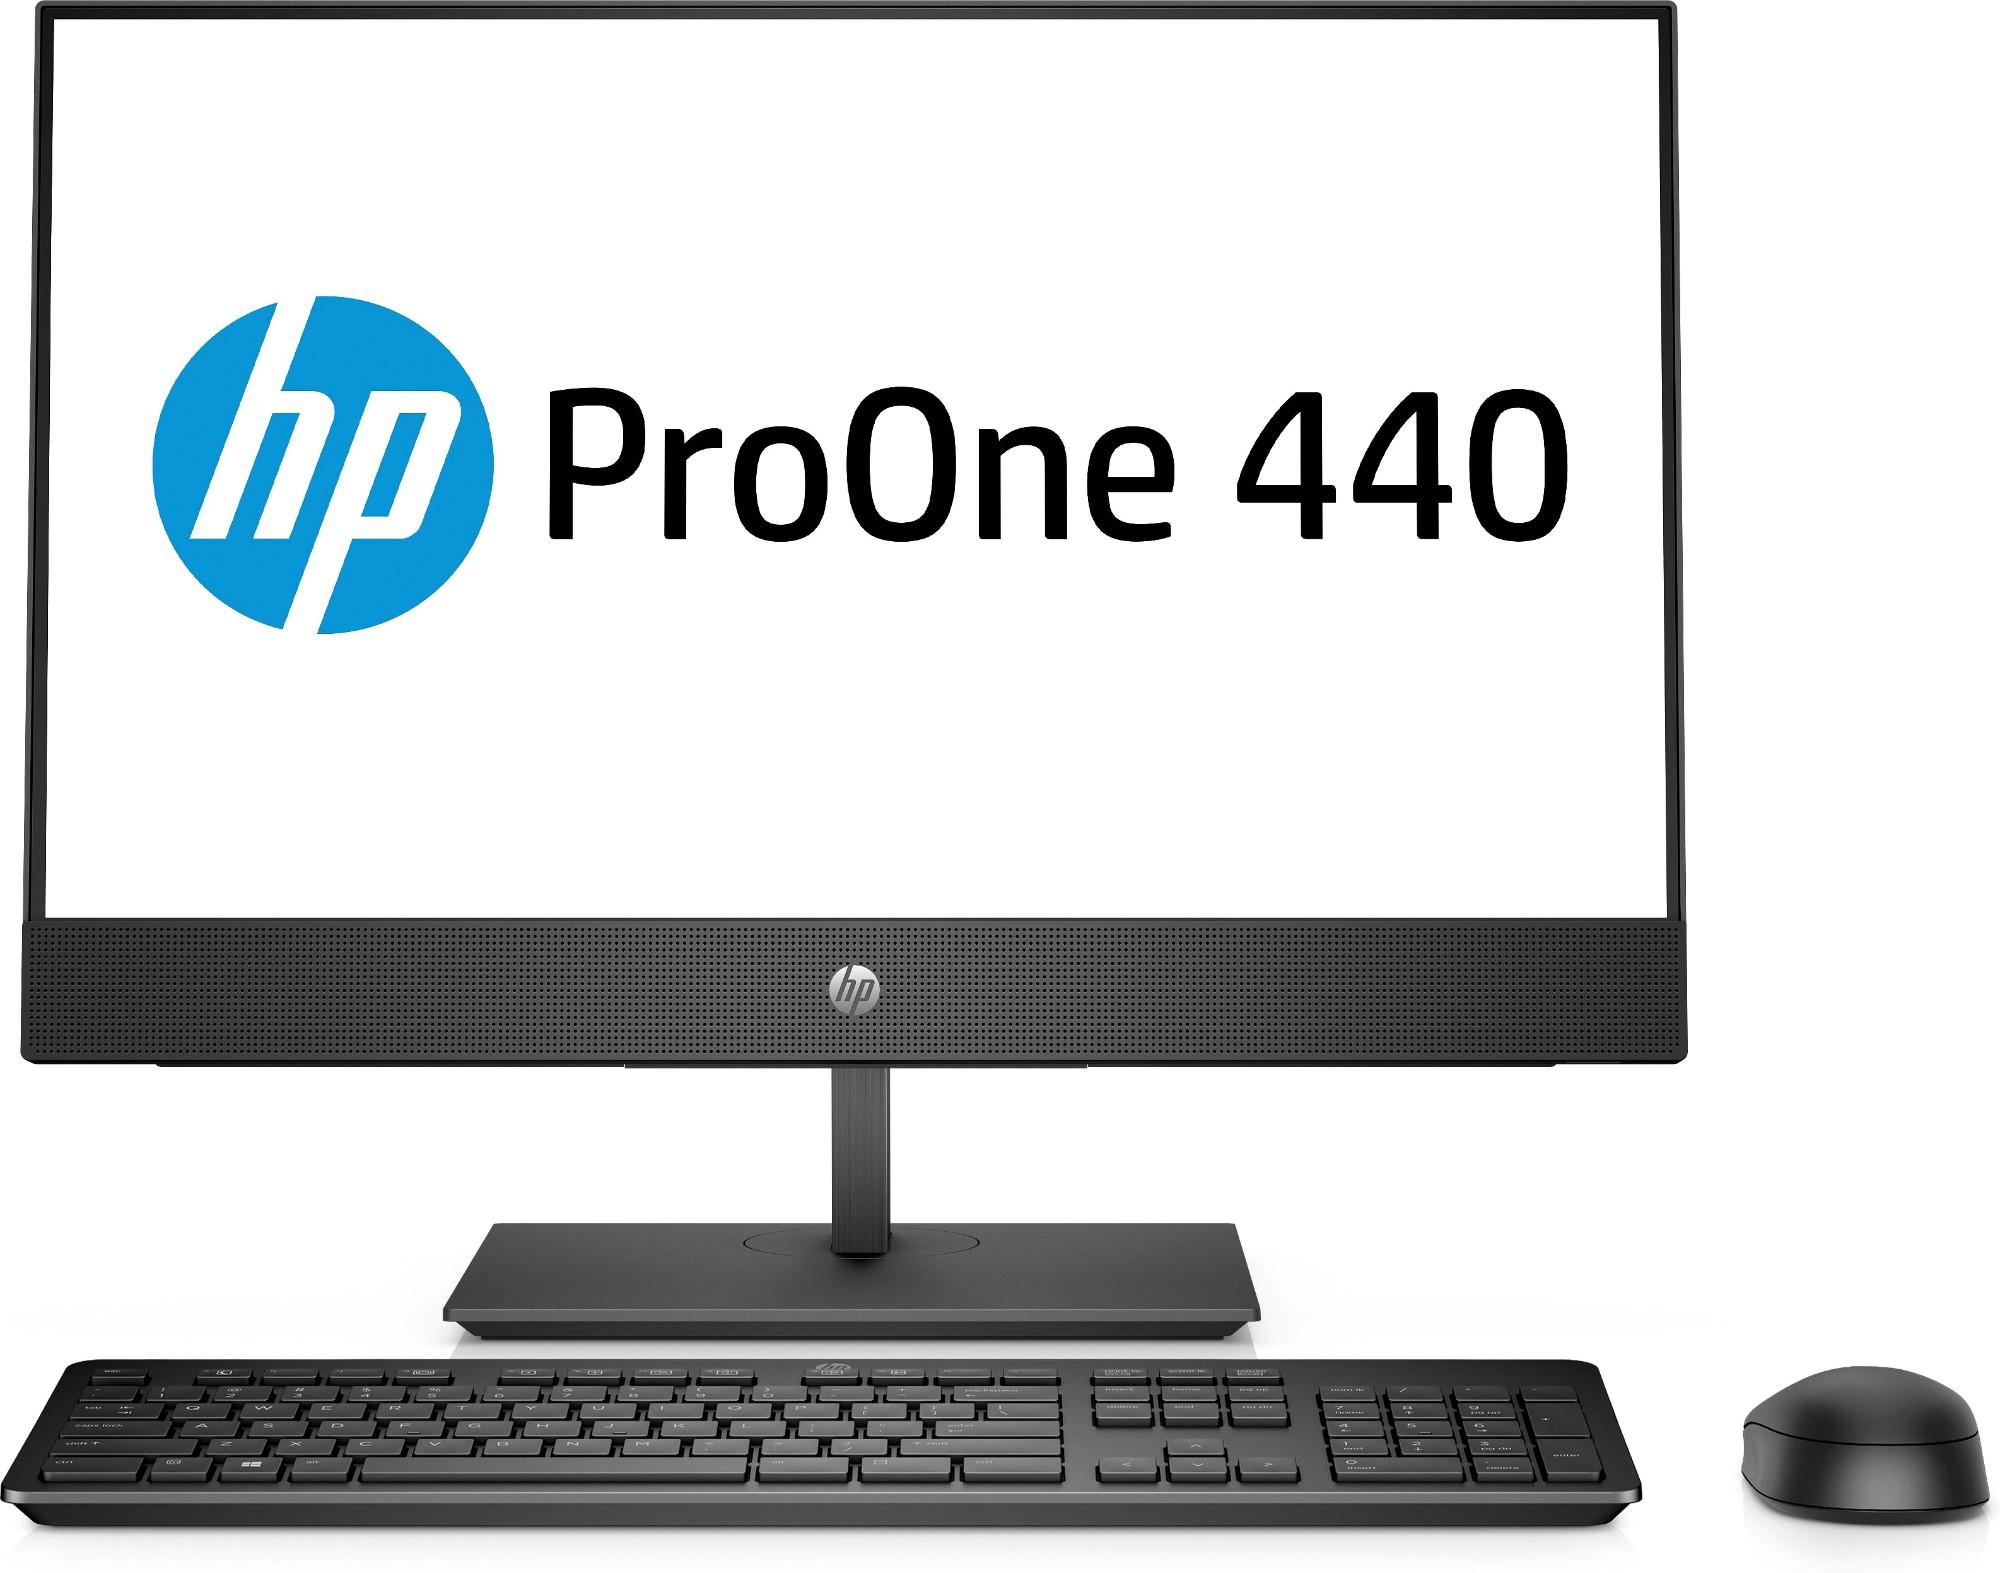 HP ProOne 440 G4 2.1GHz i5-8500T 8th gen Intel® Core™ i5 23.8